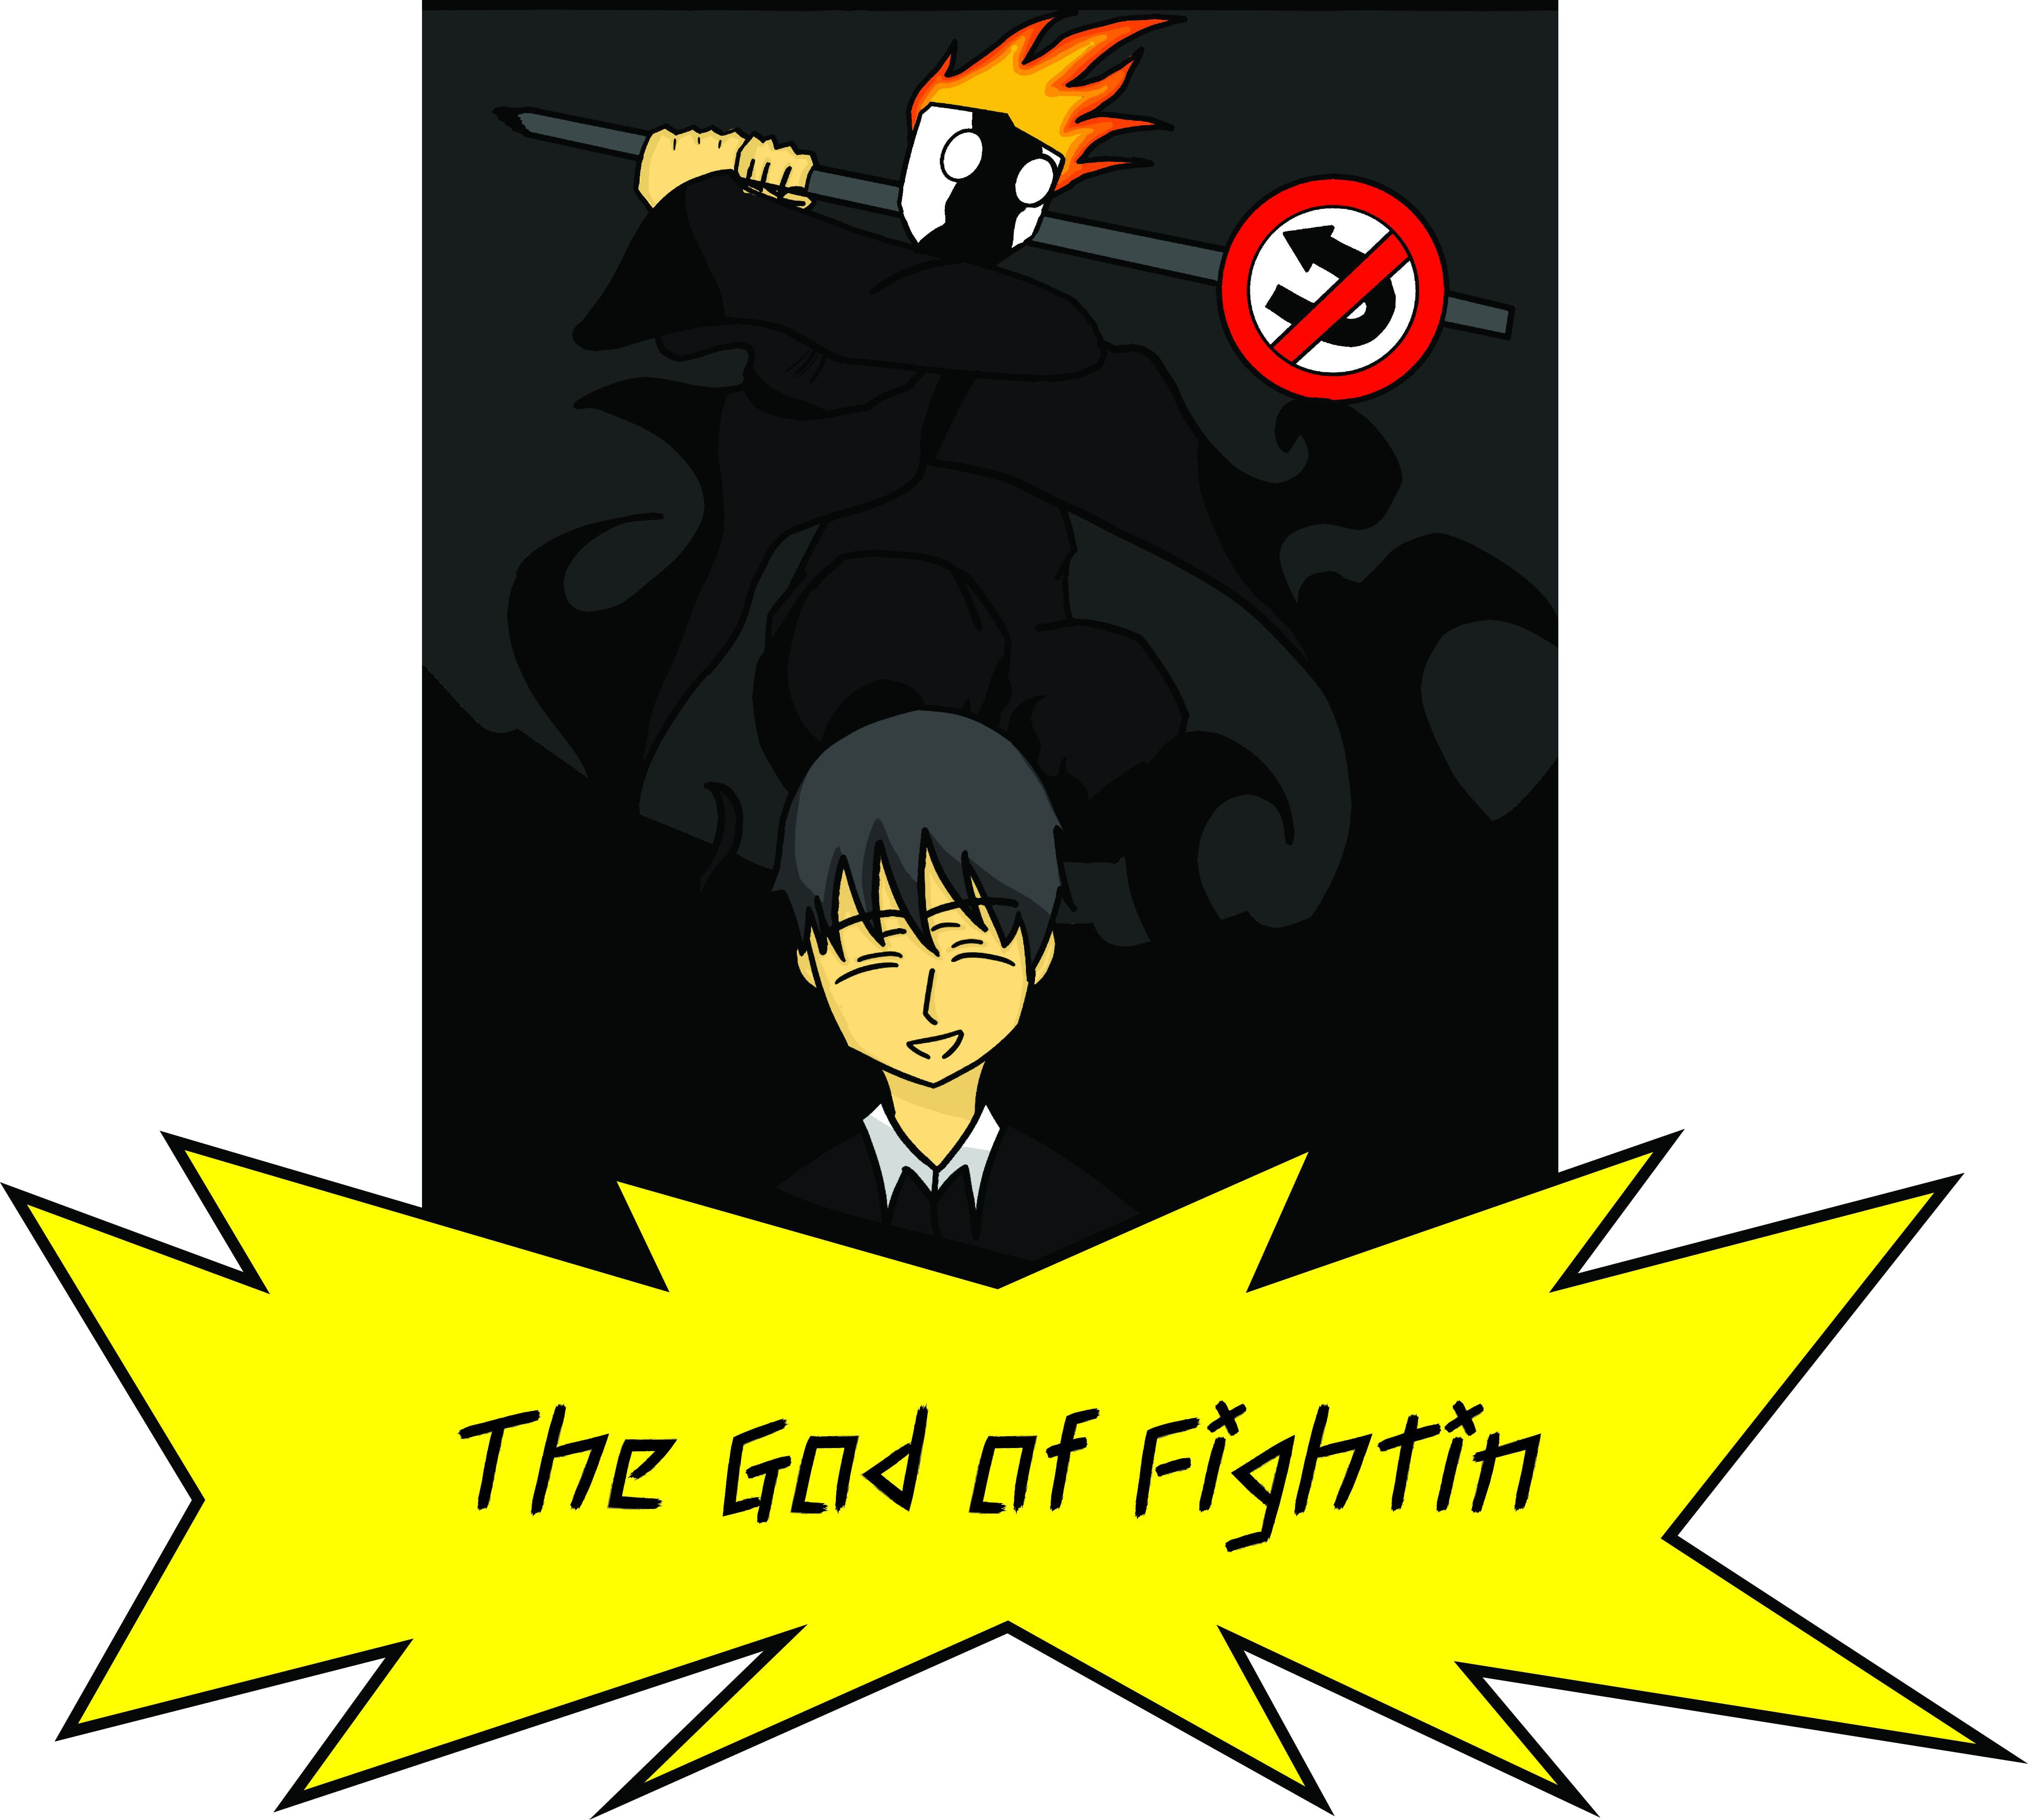 THE GOD OF FIGHTIN